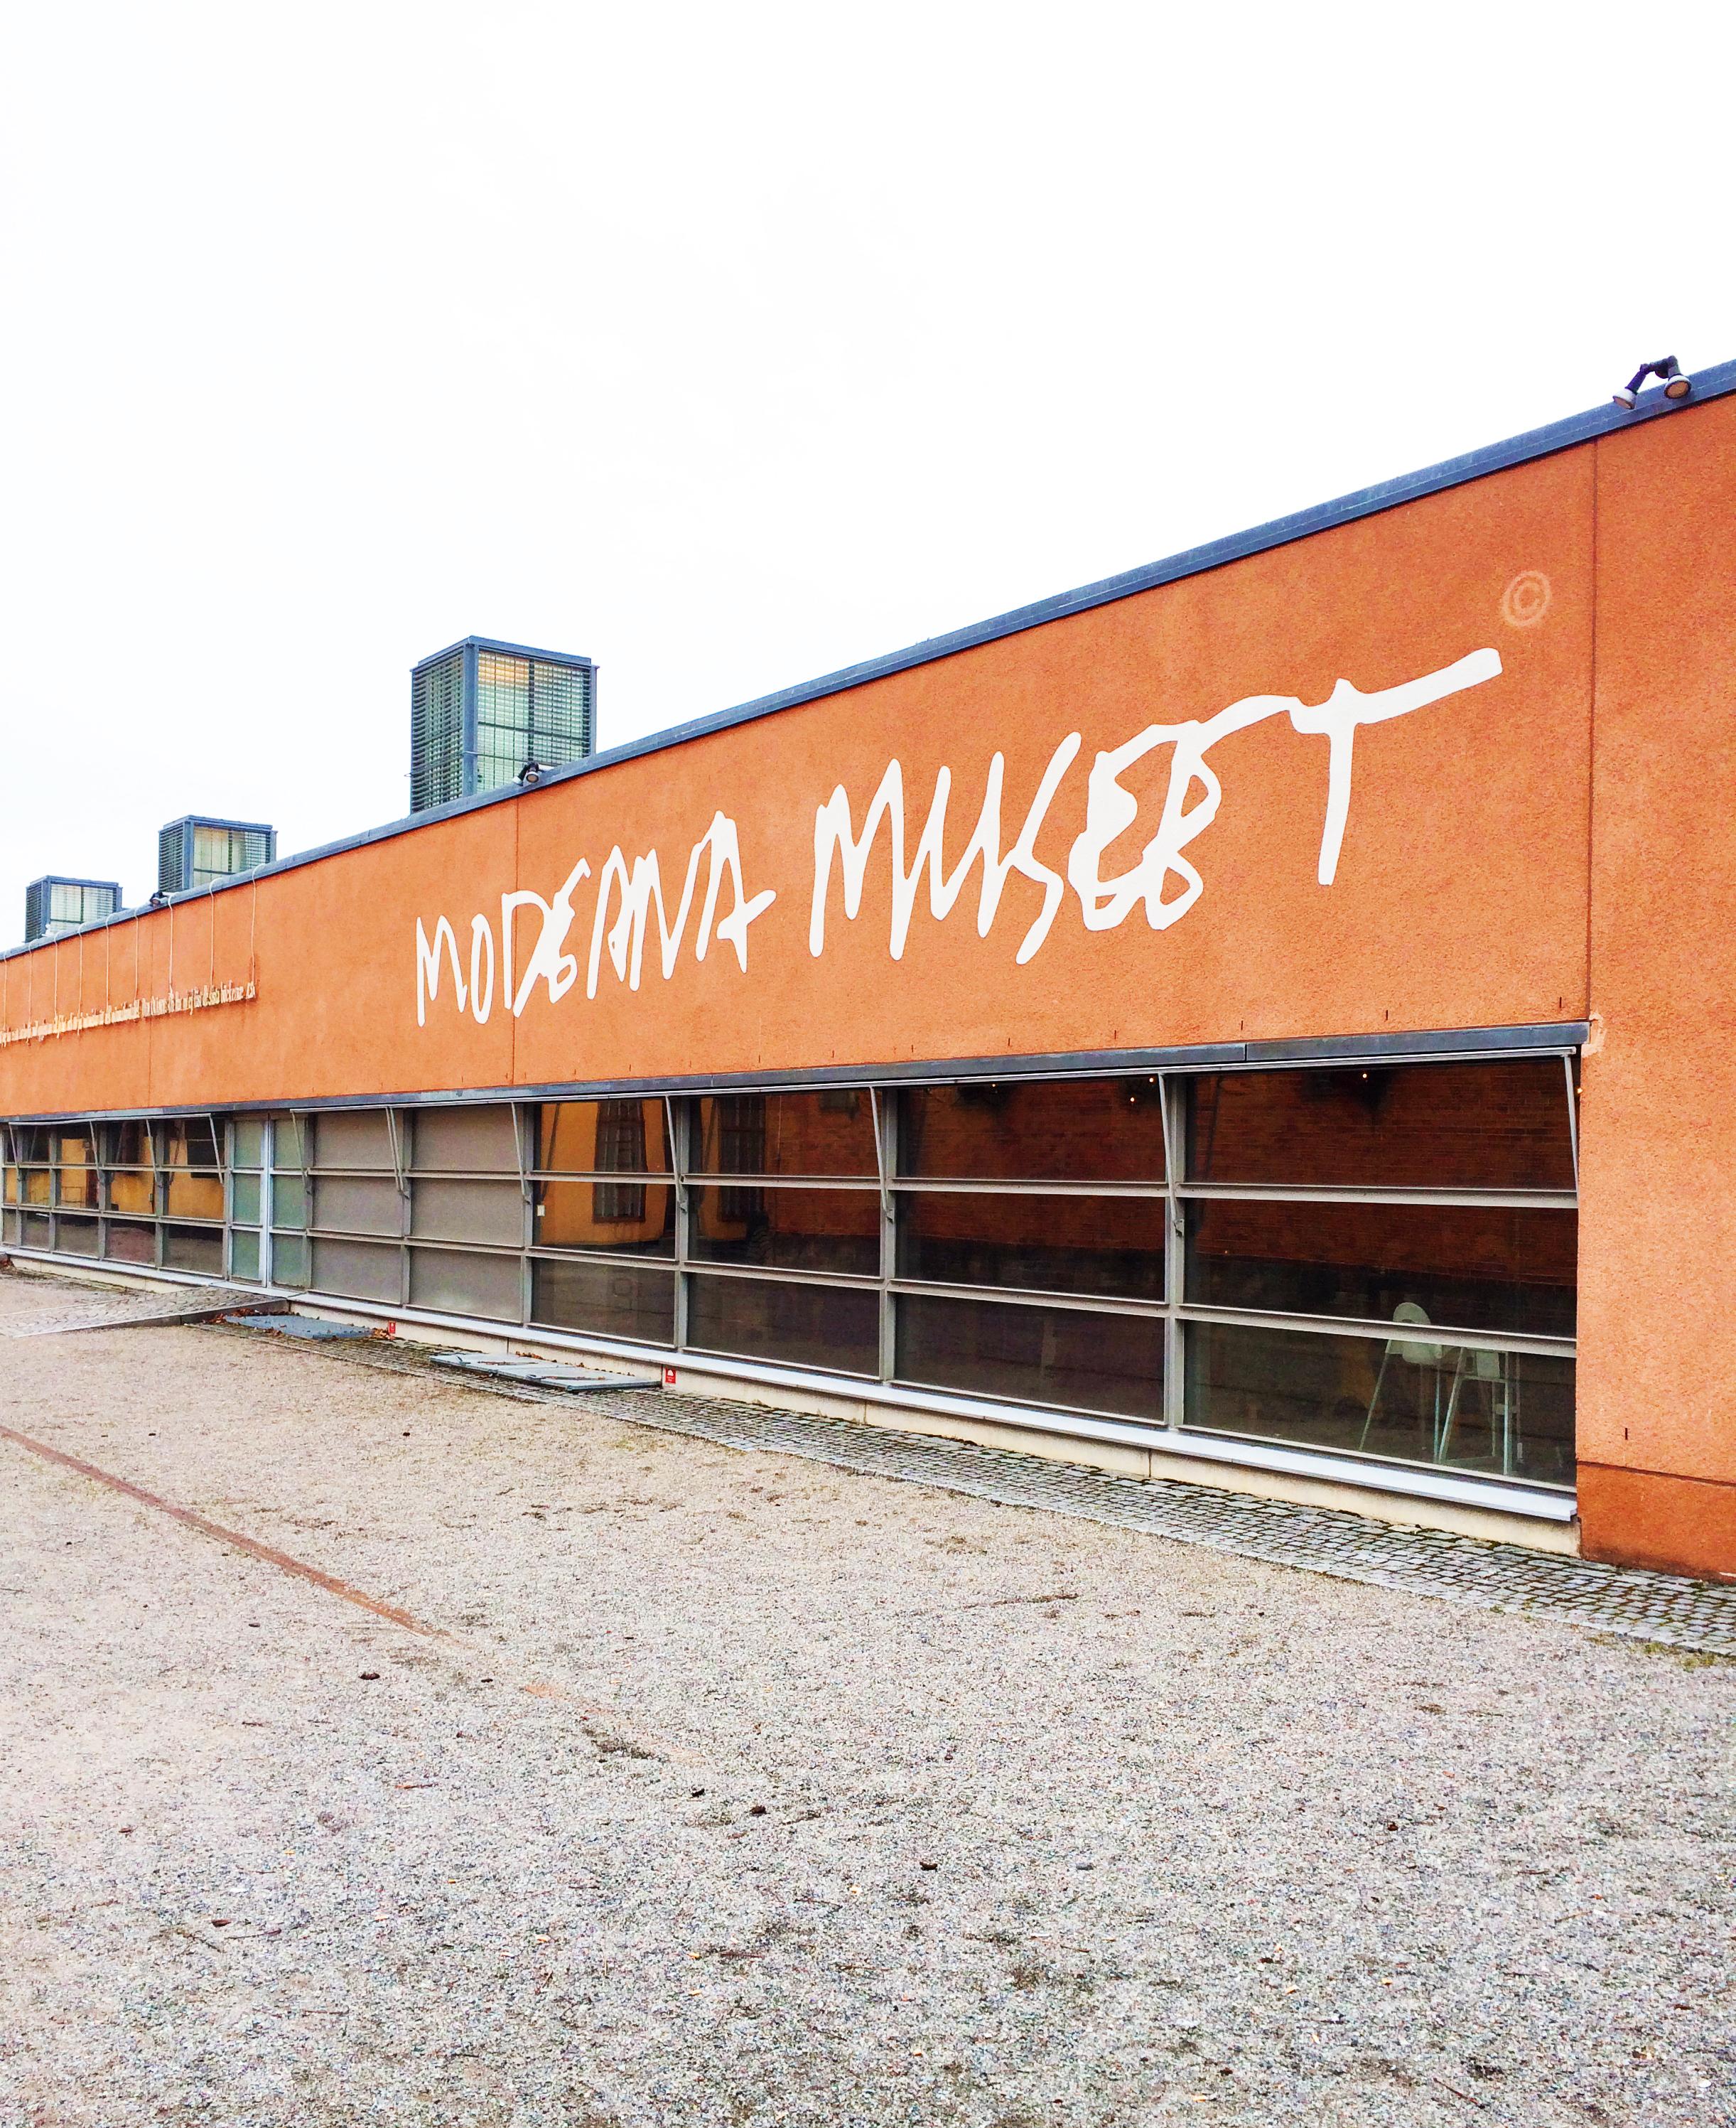 modernmuseet.jpg